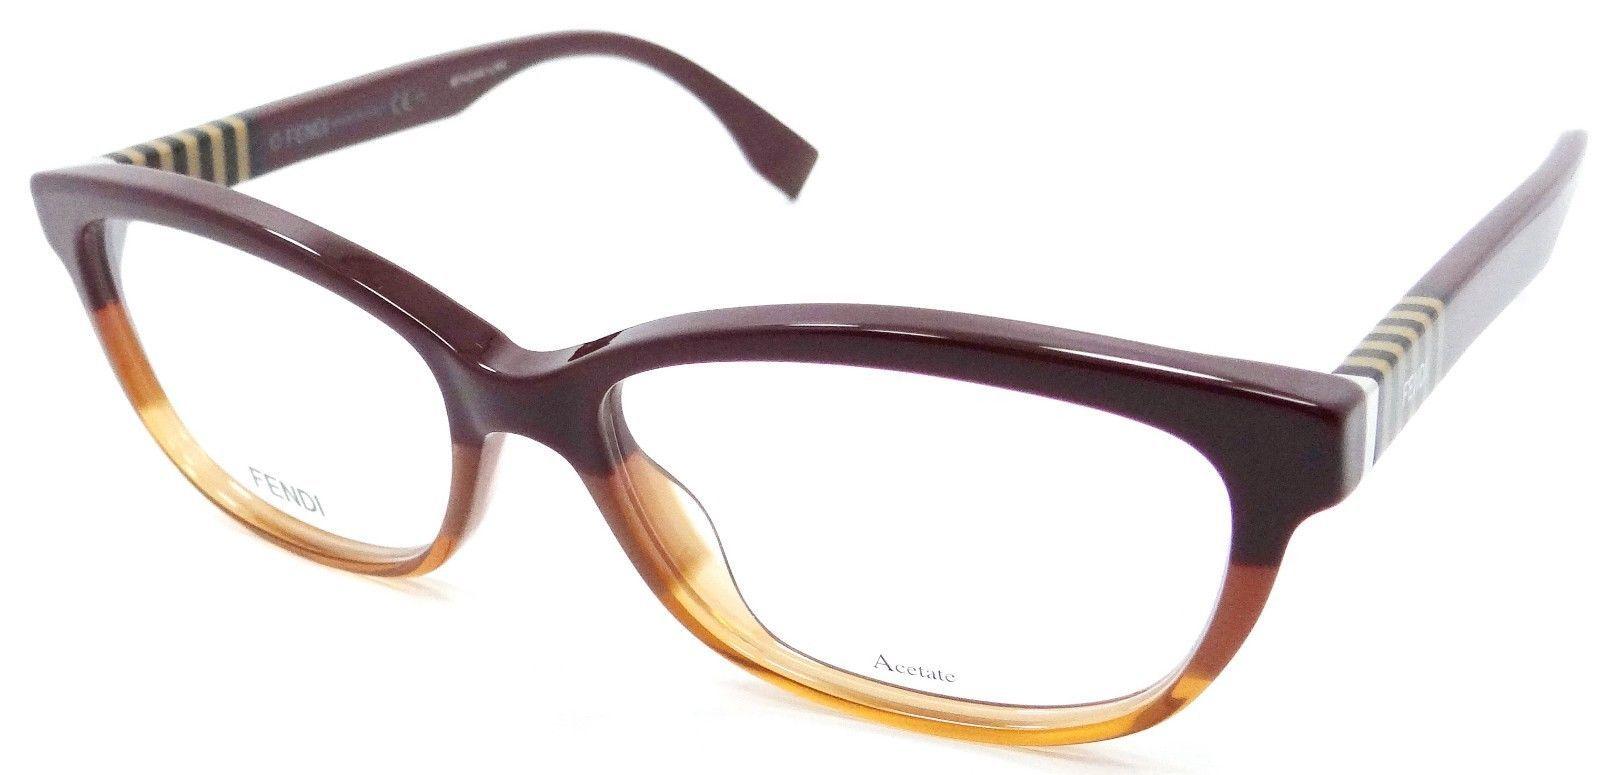 63378a7c7a0 Fendi Rx Eyeglasses Frames FF 0015 H95 and 50 similar items